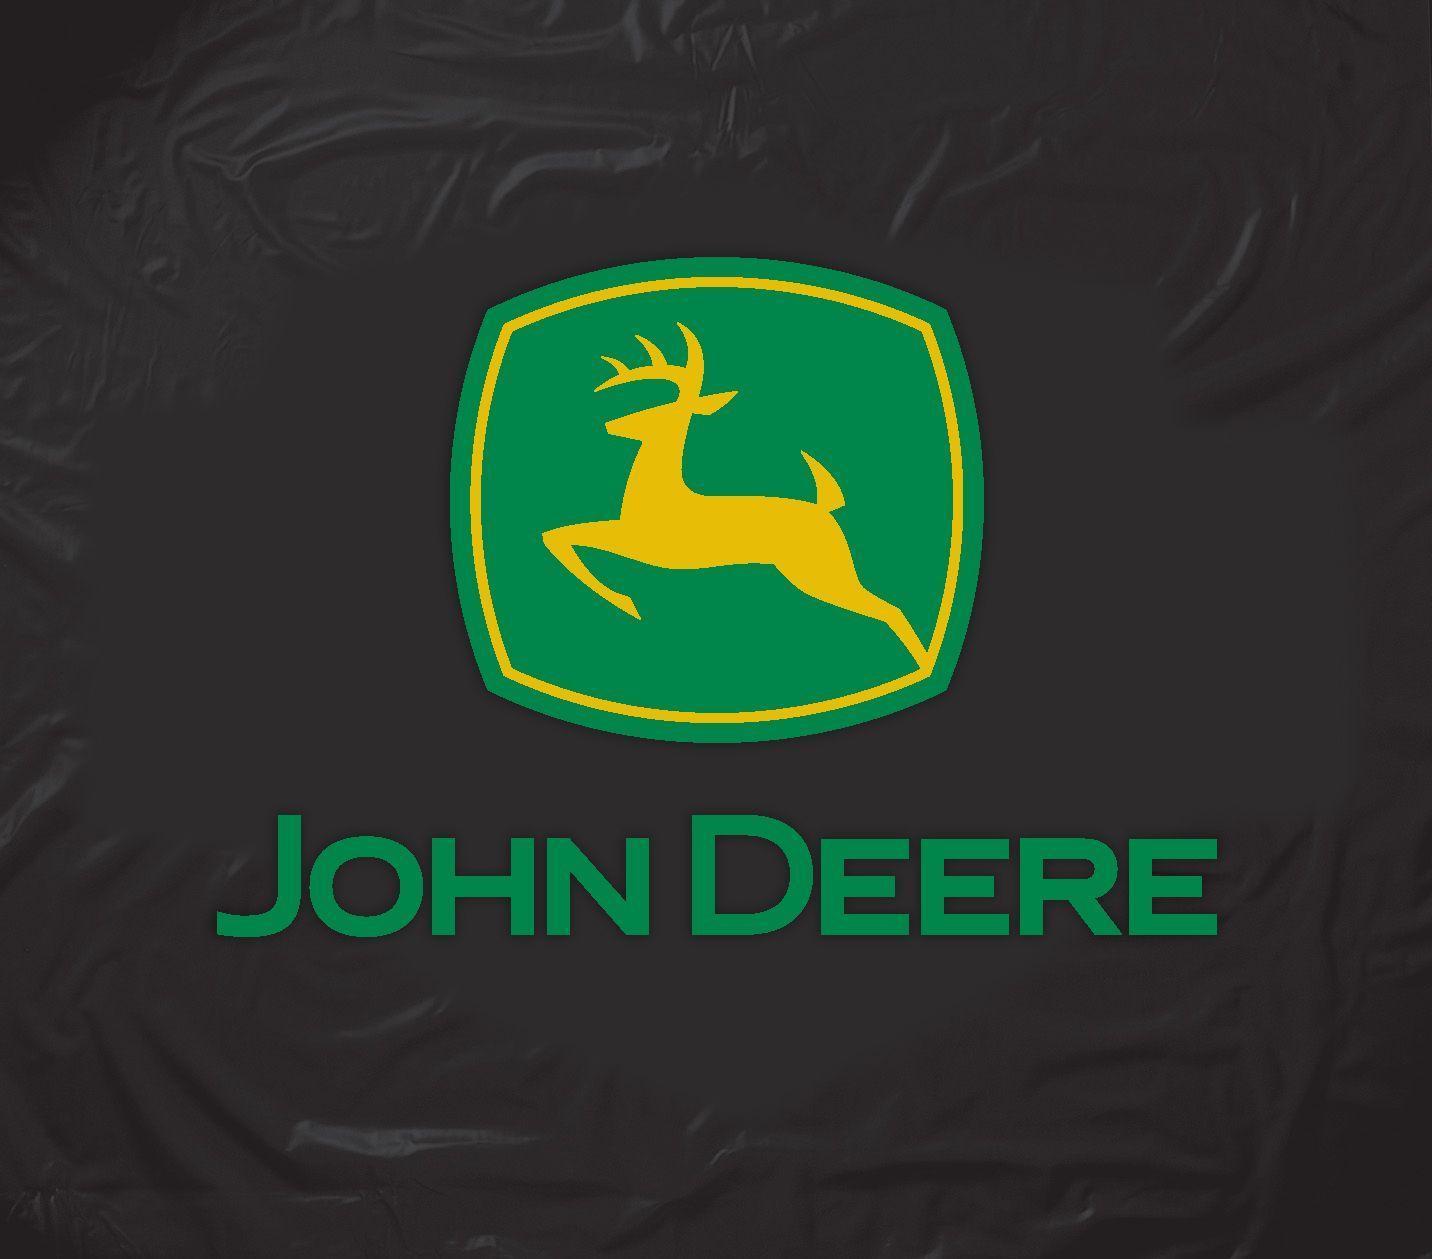 John Deere Logo Wallpapers 1432x1259